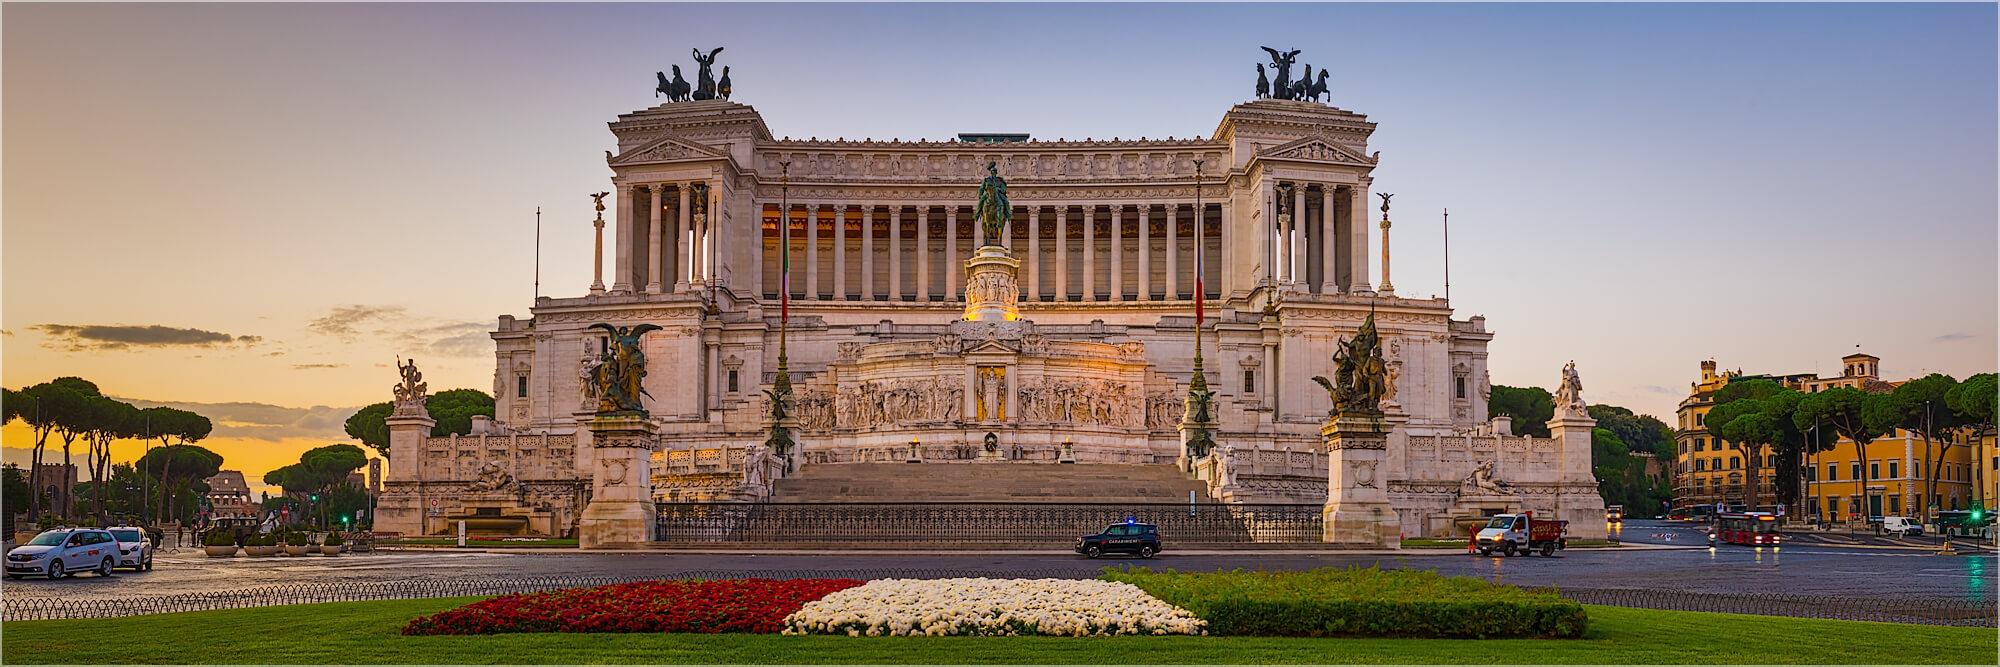 Panoramafoto Parlament Rom Italien